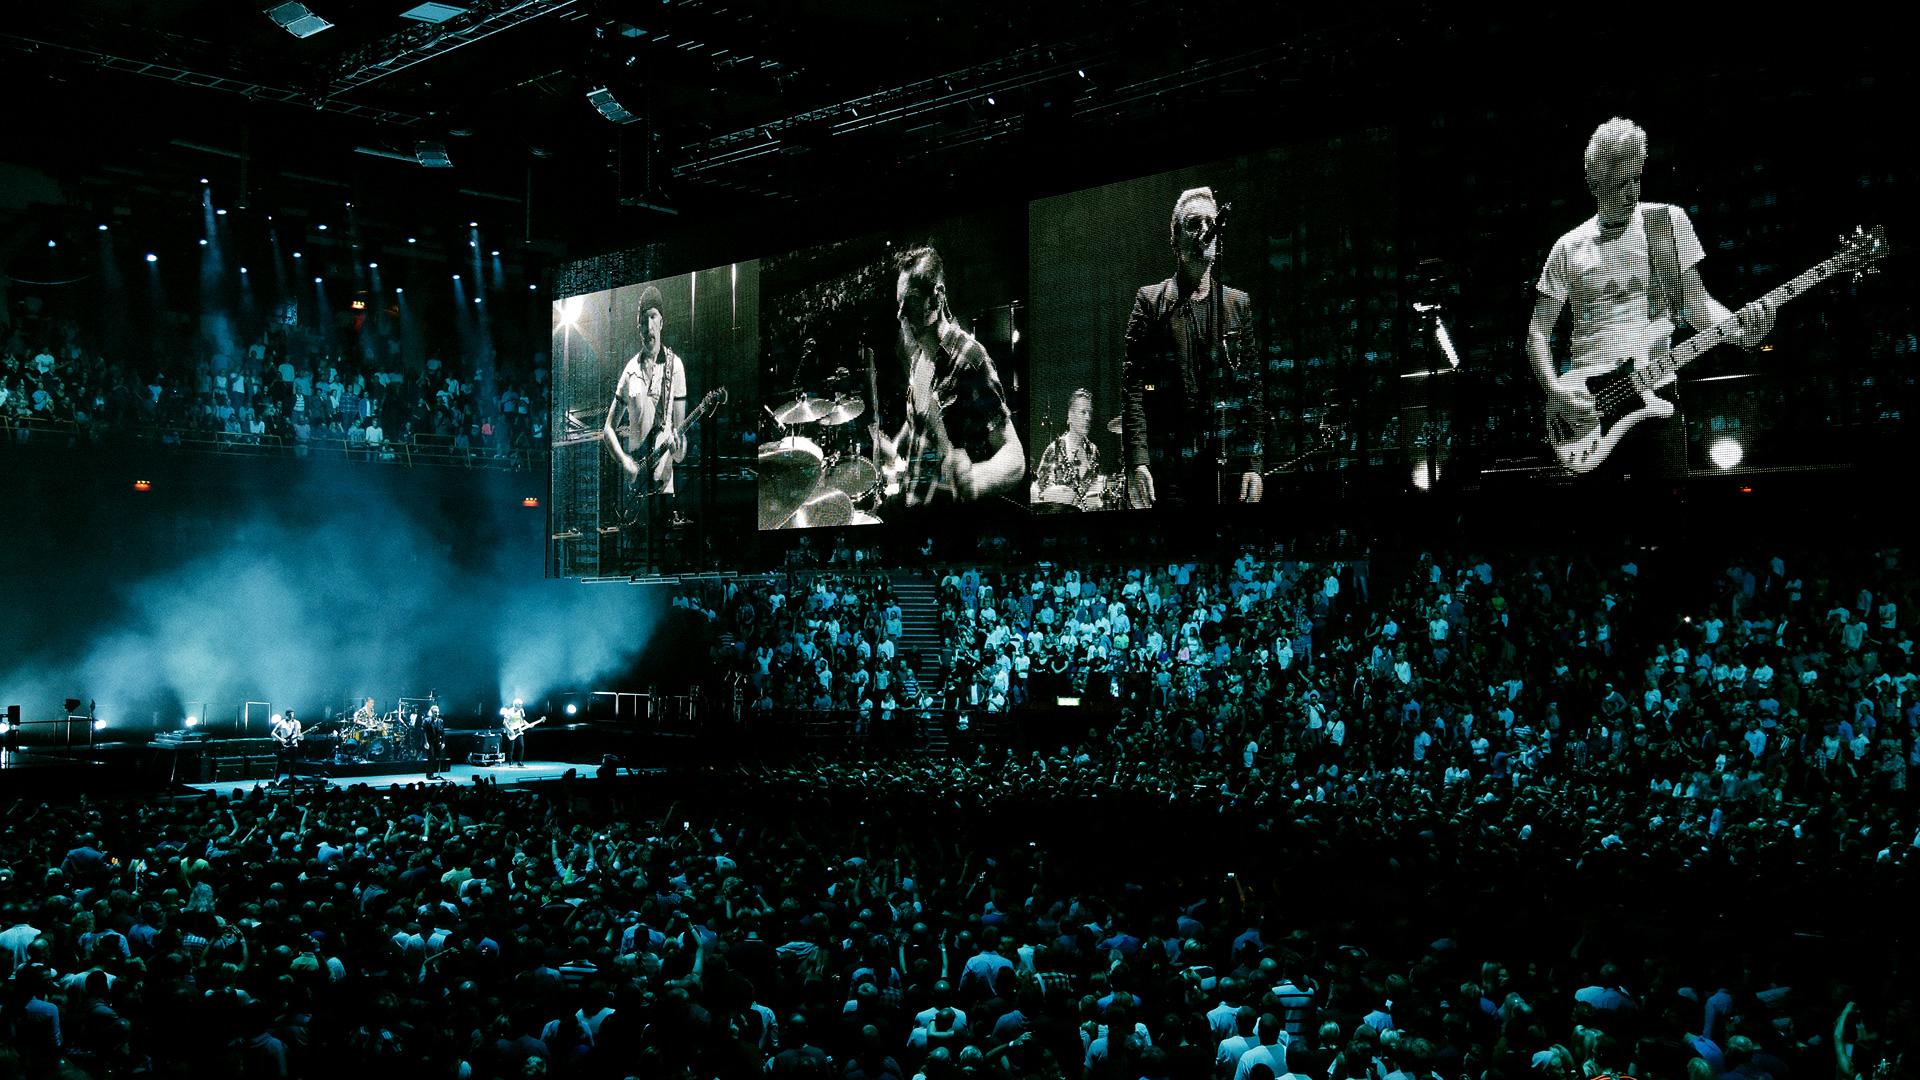 U2 Innocence + Experience Live In Paris